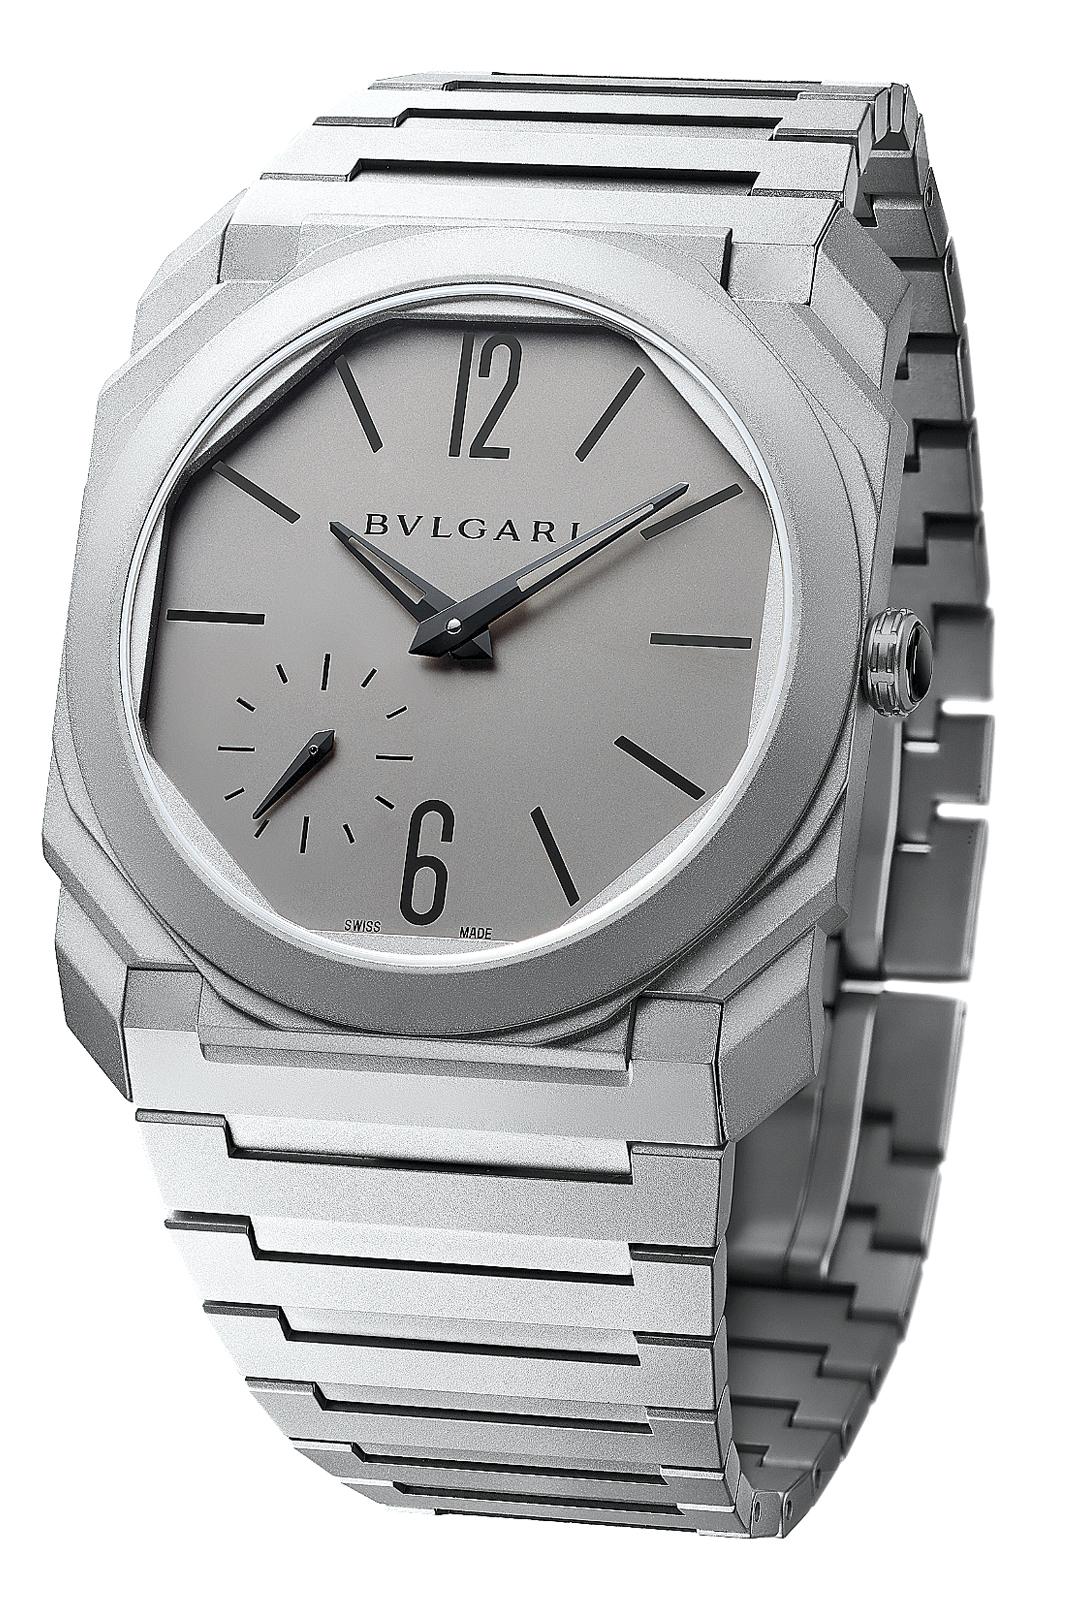 Armbanduhren Bulgari